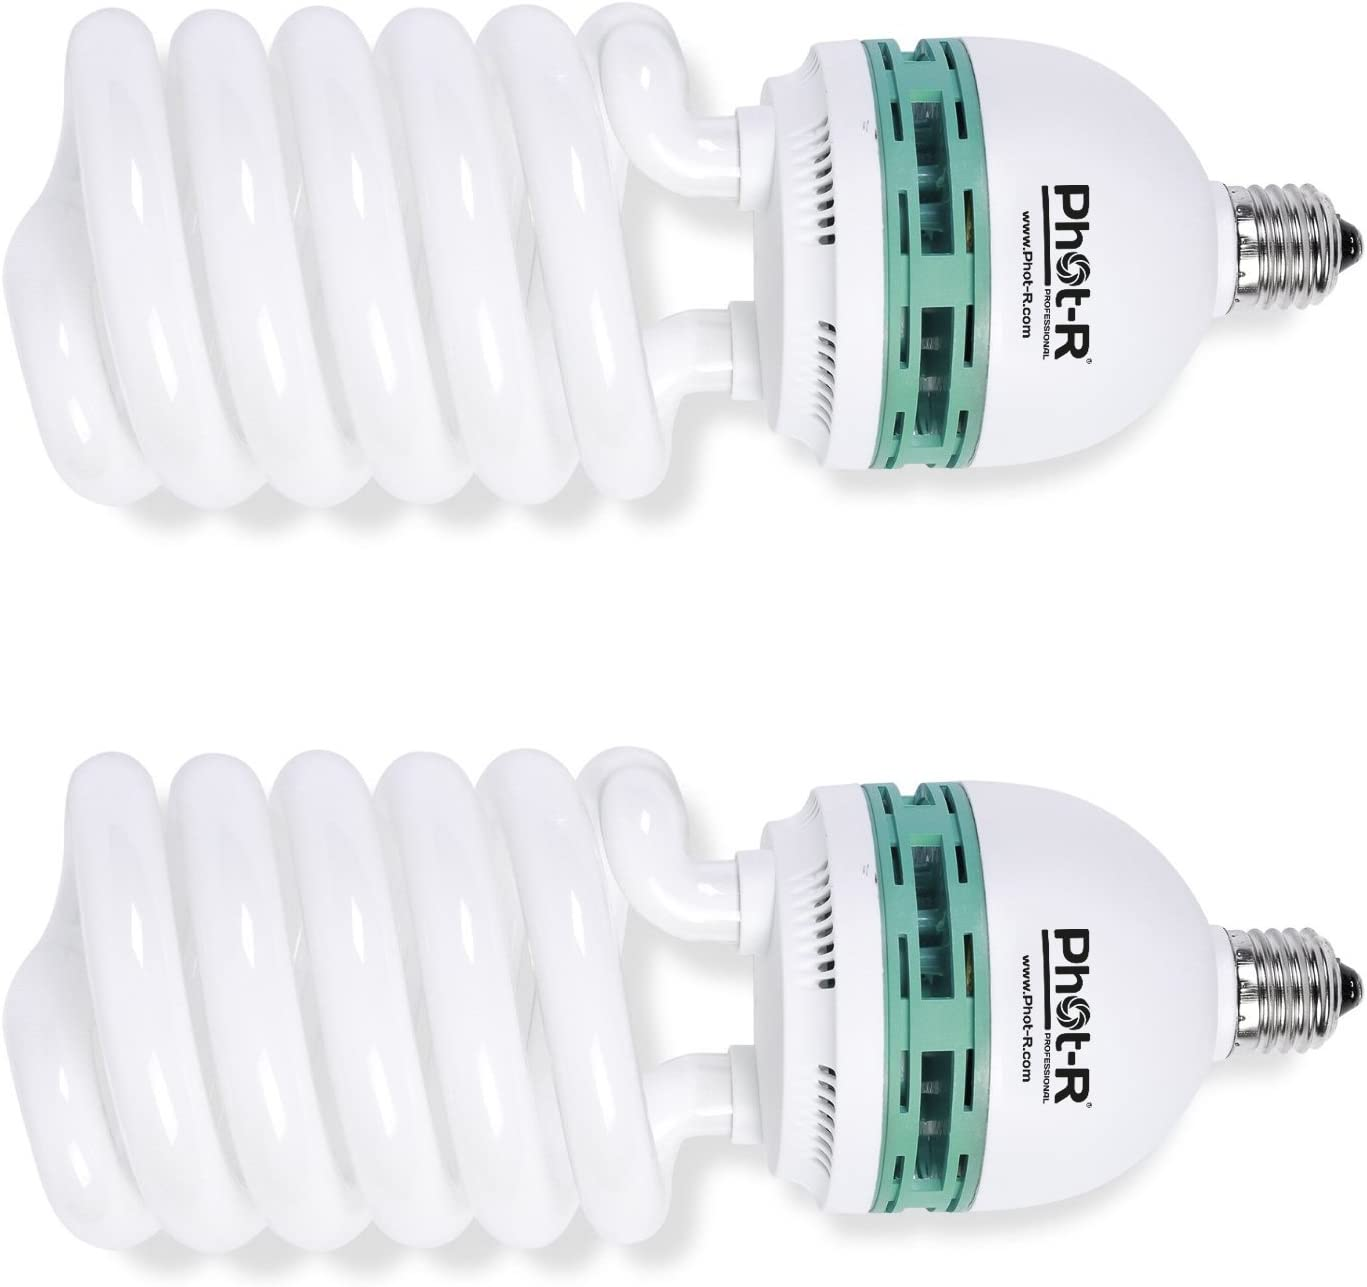 125w EQ 5500K E27 25w Photo Studio Daylight Spiral Light Bulb Lamp 240v 2 PACK